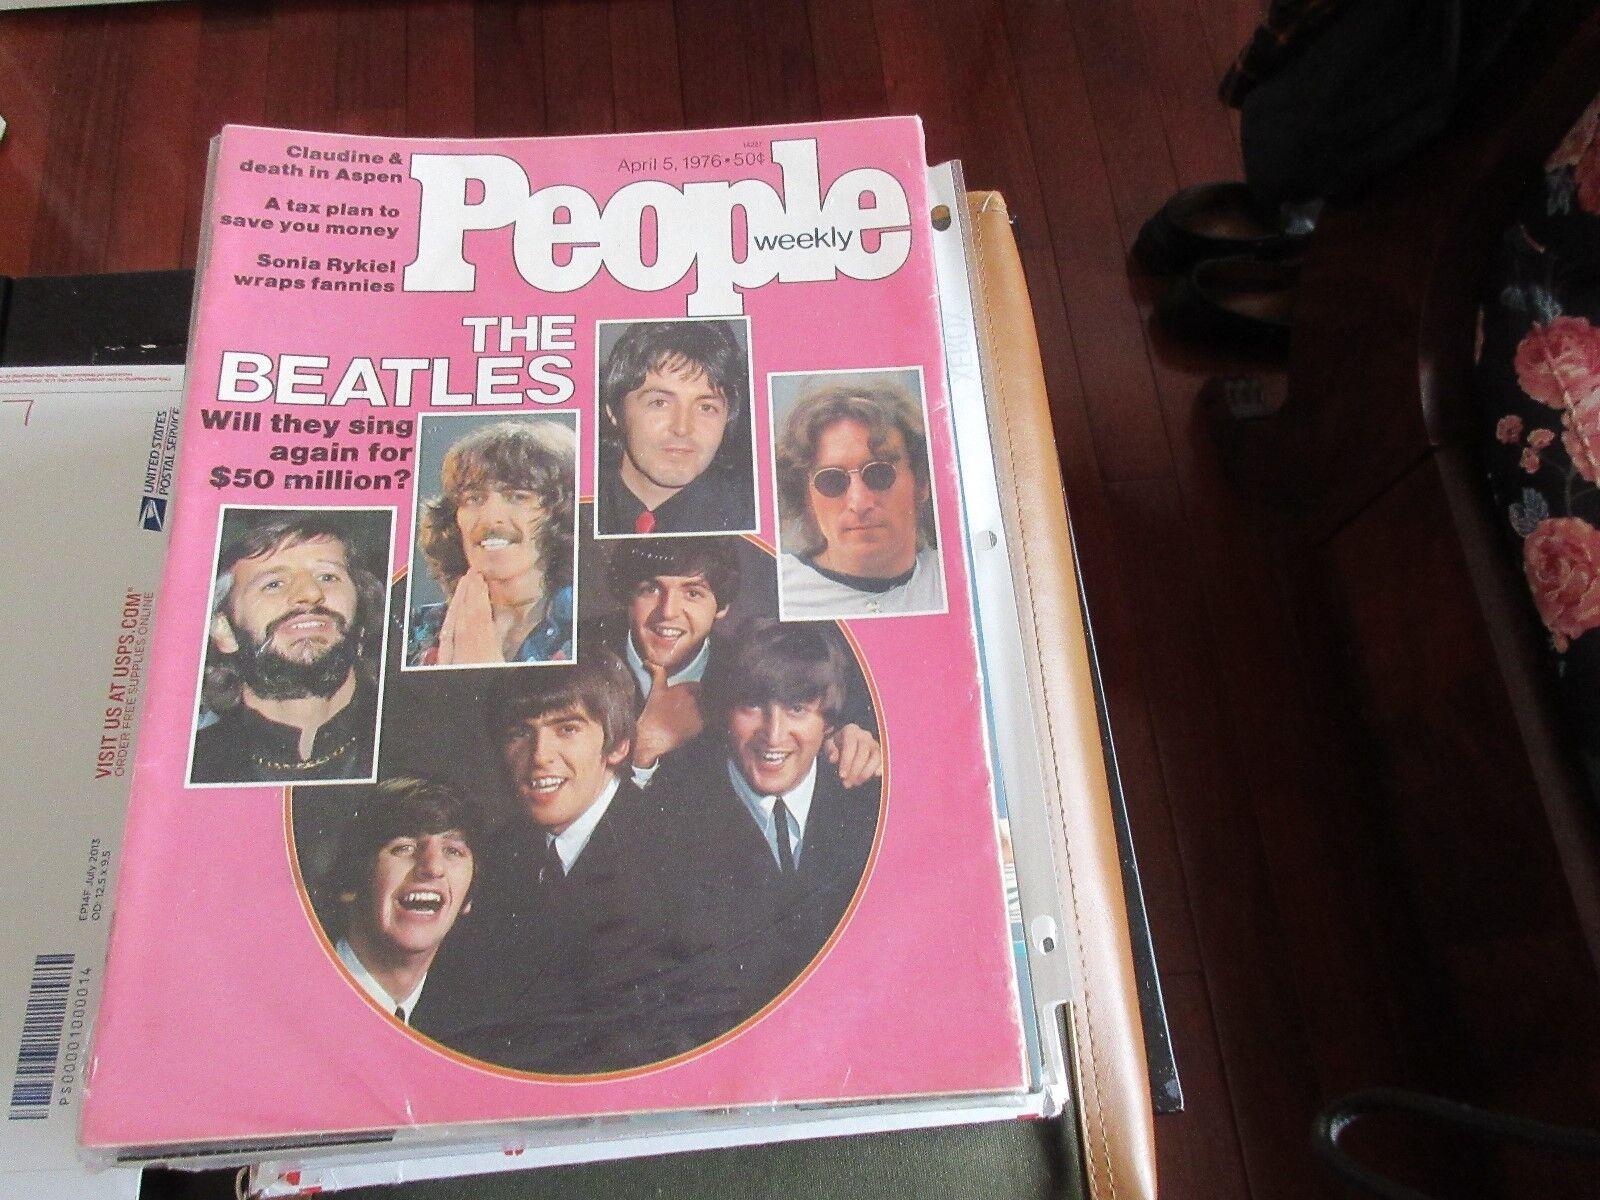 THE BEATLES , PEOPLE MAGAZINE , 4/5/76 , Claudine , Son